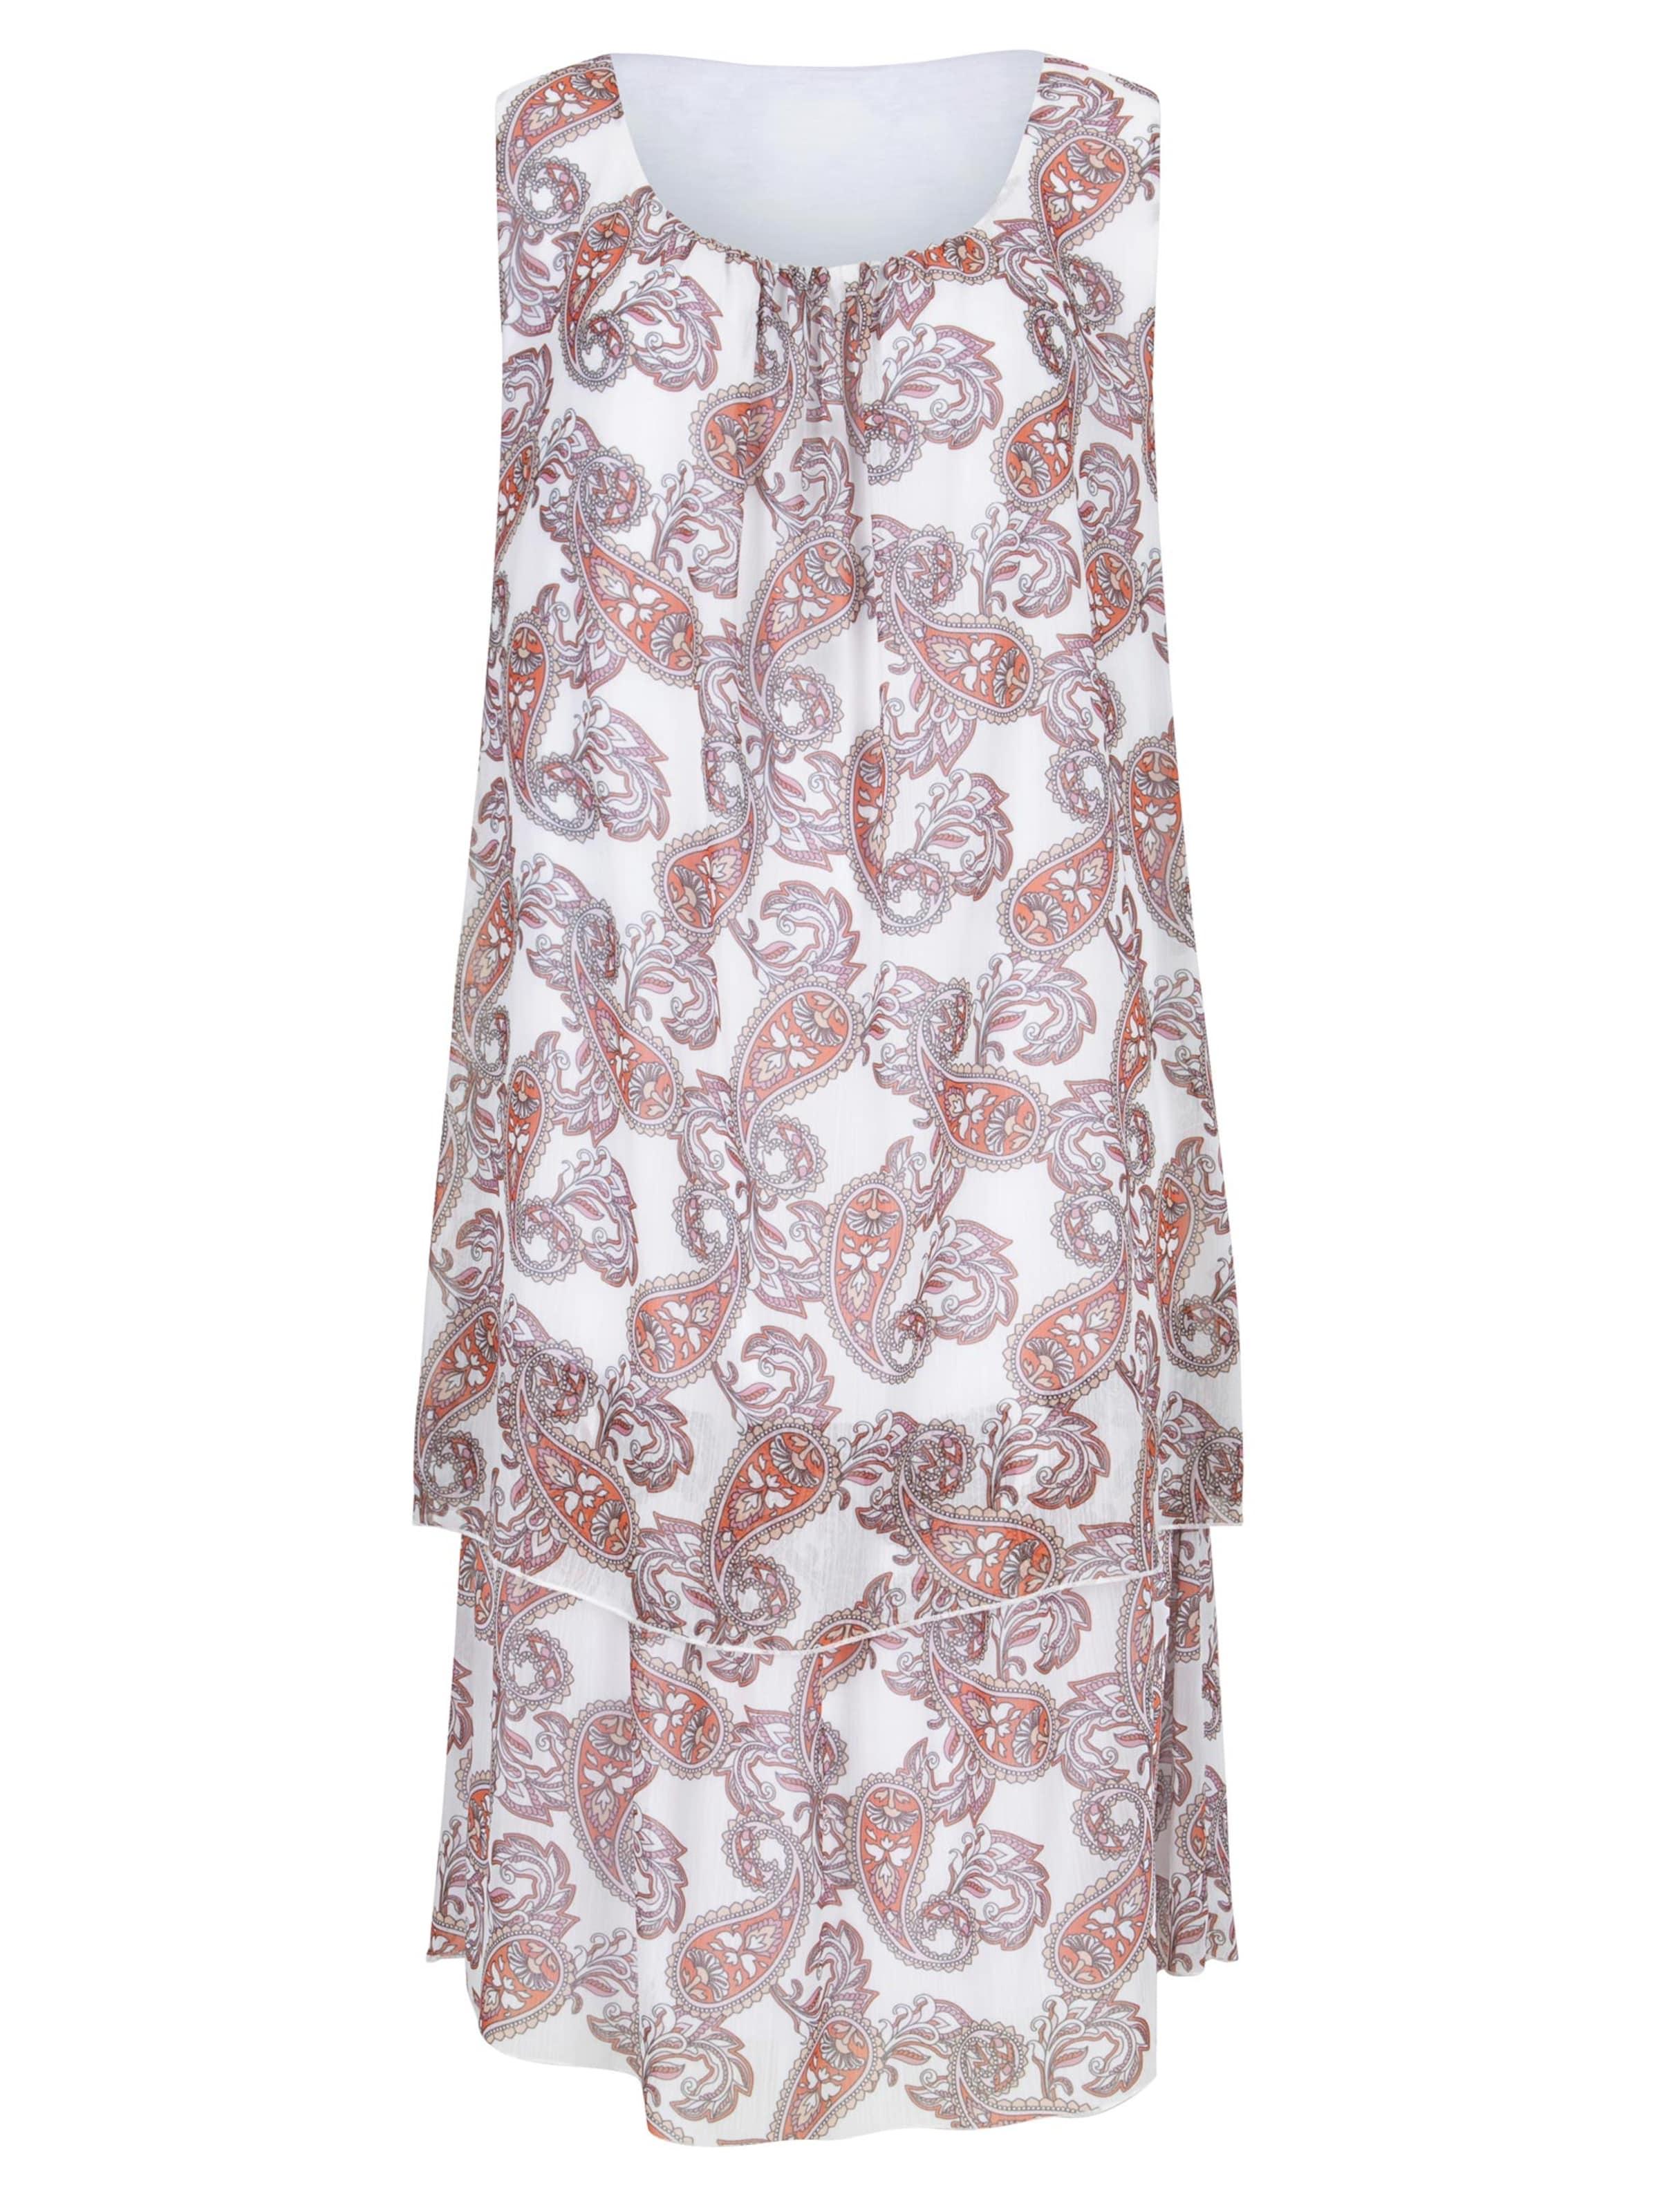 witt weiden -  Damen Druck-Kleid flamingo-ecru-bedruckt